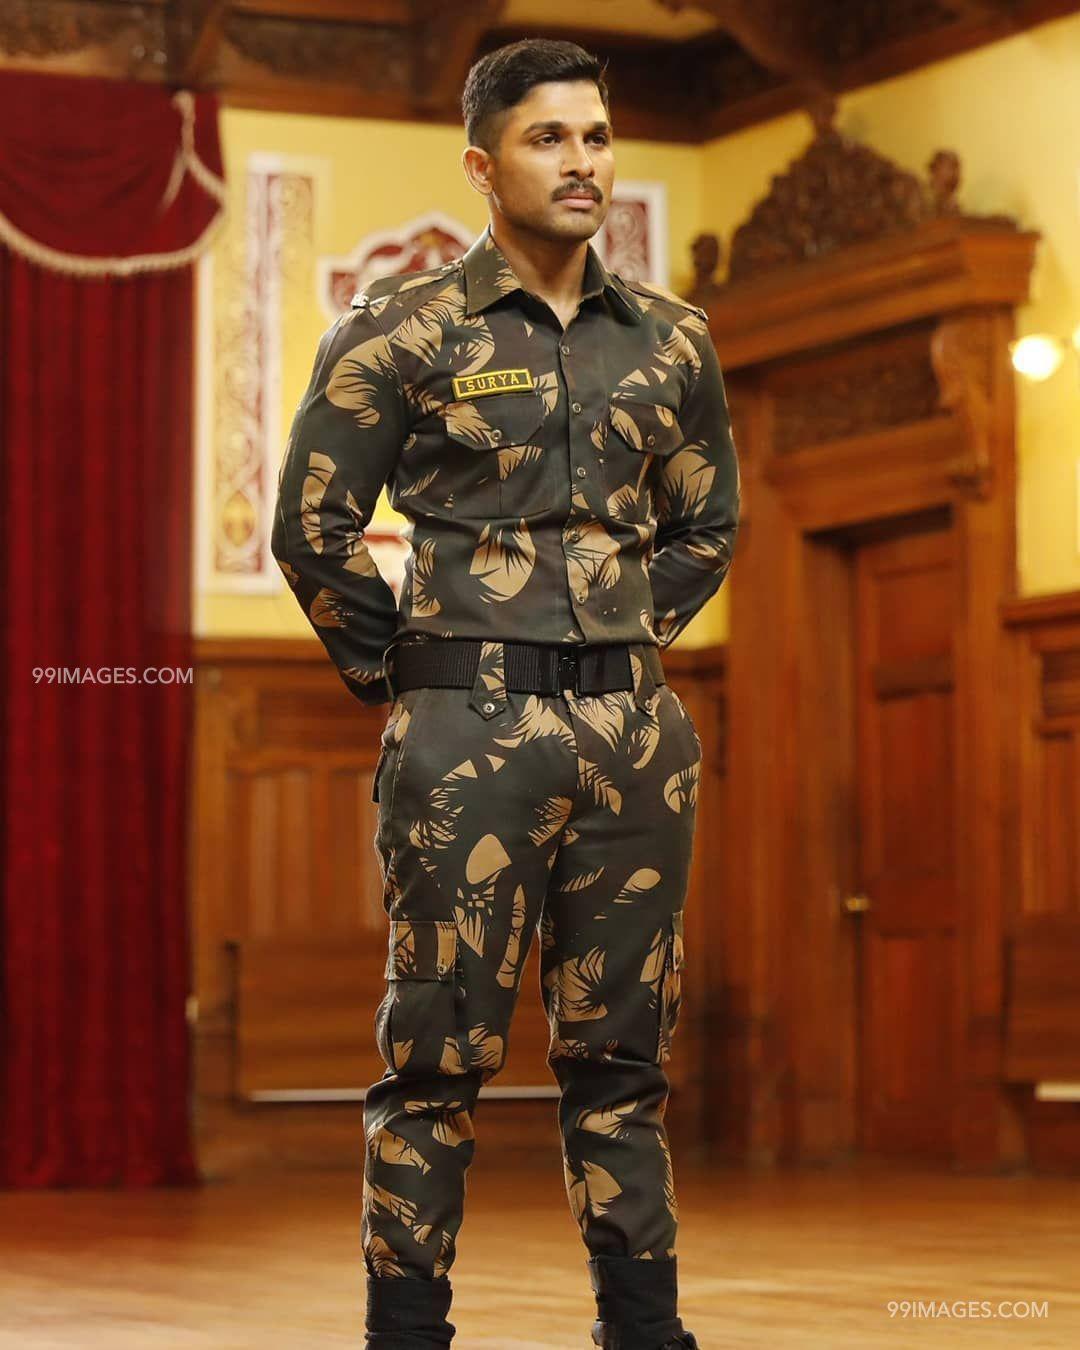 Allu Arjun Latest Photos Hd Wallpapers 1080p Hd Wallpapers 1080p Allu Arjun Wallpapers Indian Army Wallpapers